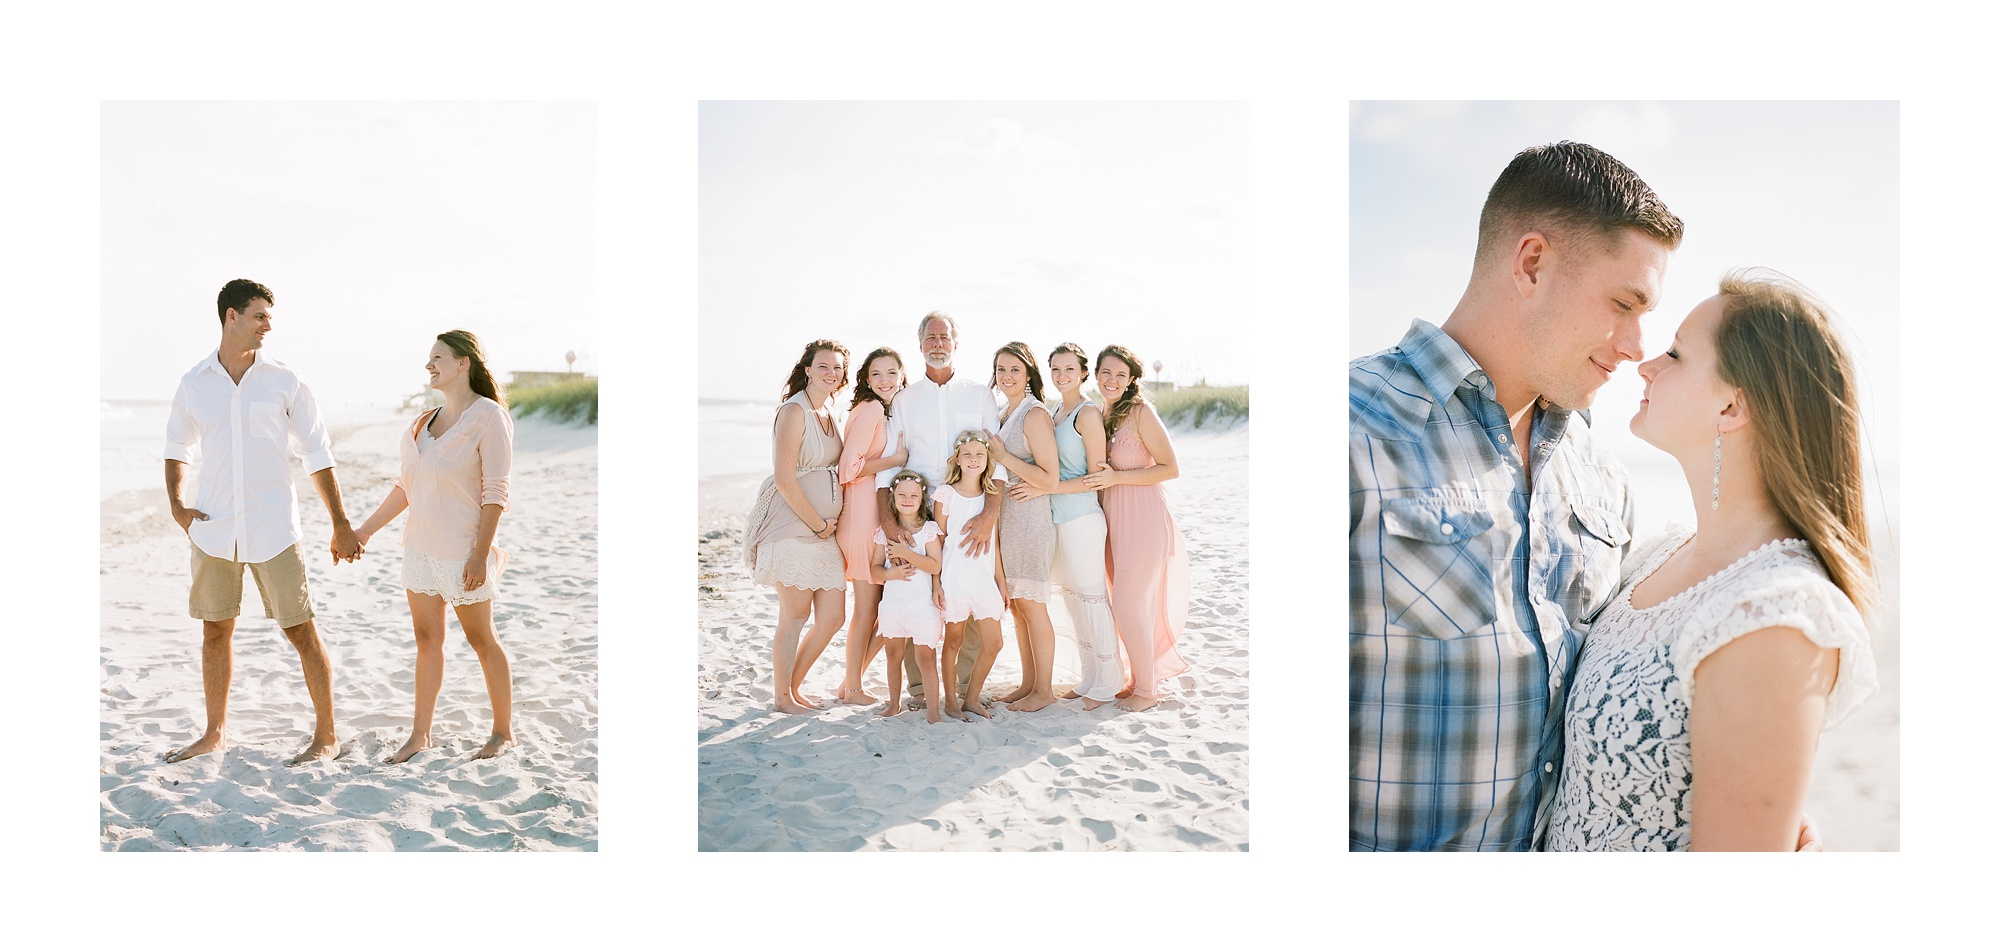 Wilmington NC Photographer | Wynona Benson Photography